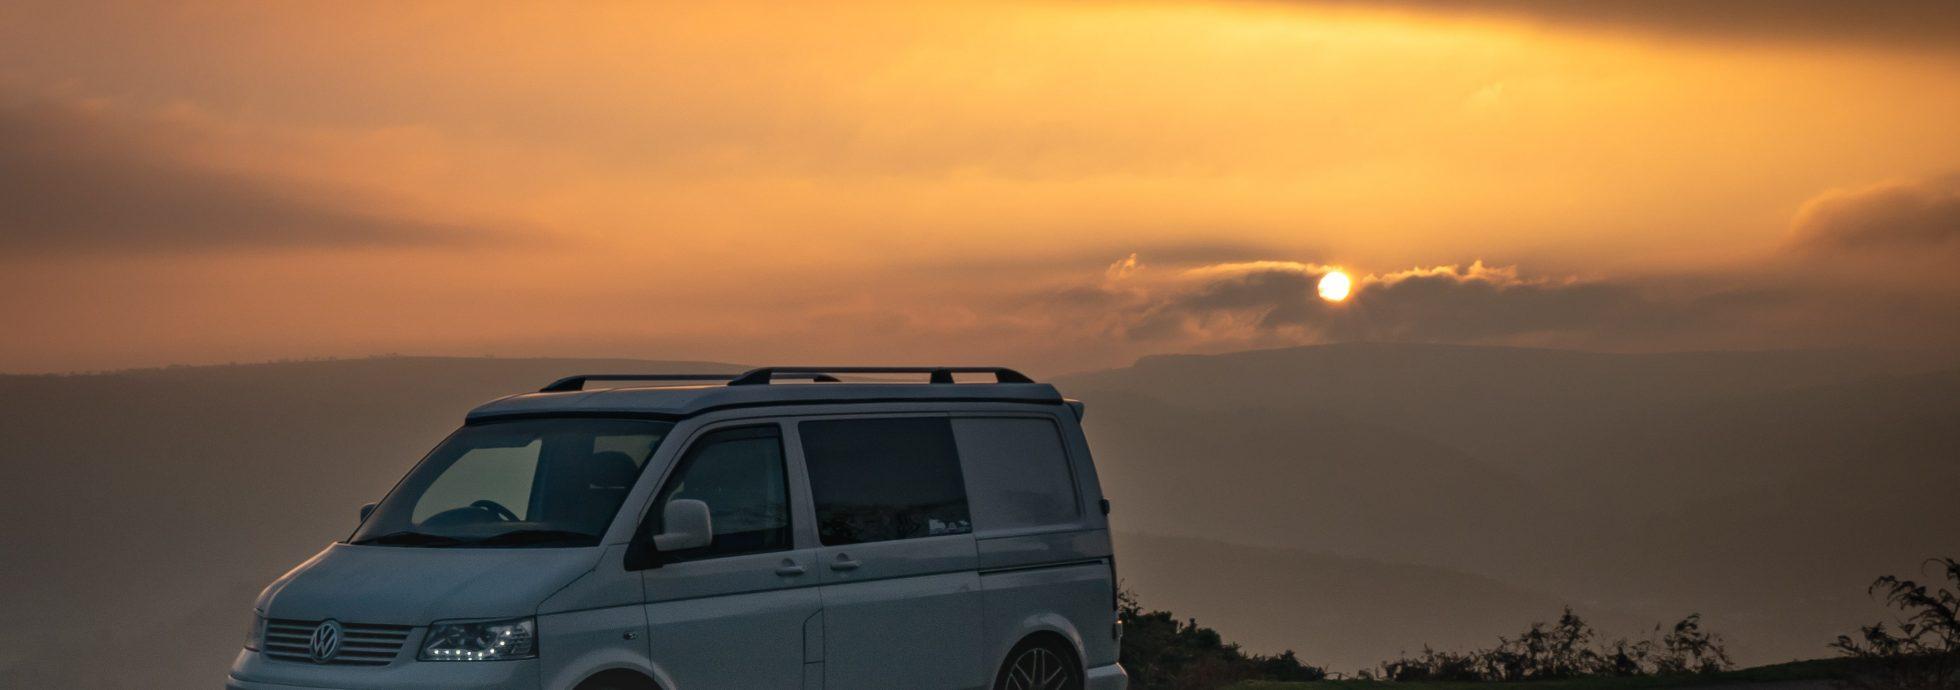 Wander Beyond Campervan Sunset-min